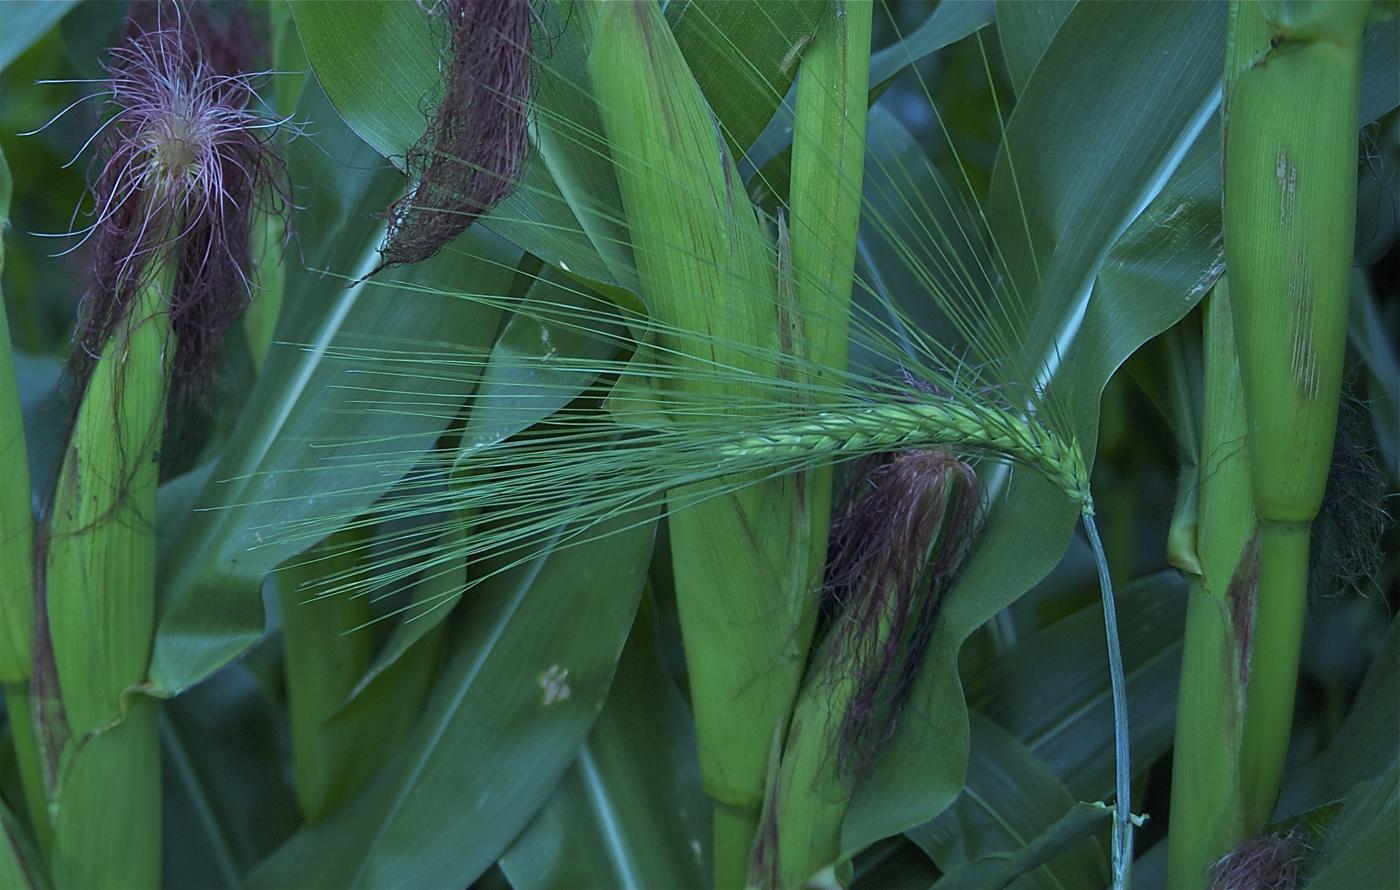 144 Dopk_Maize and Barley.jpg